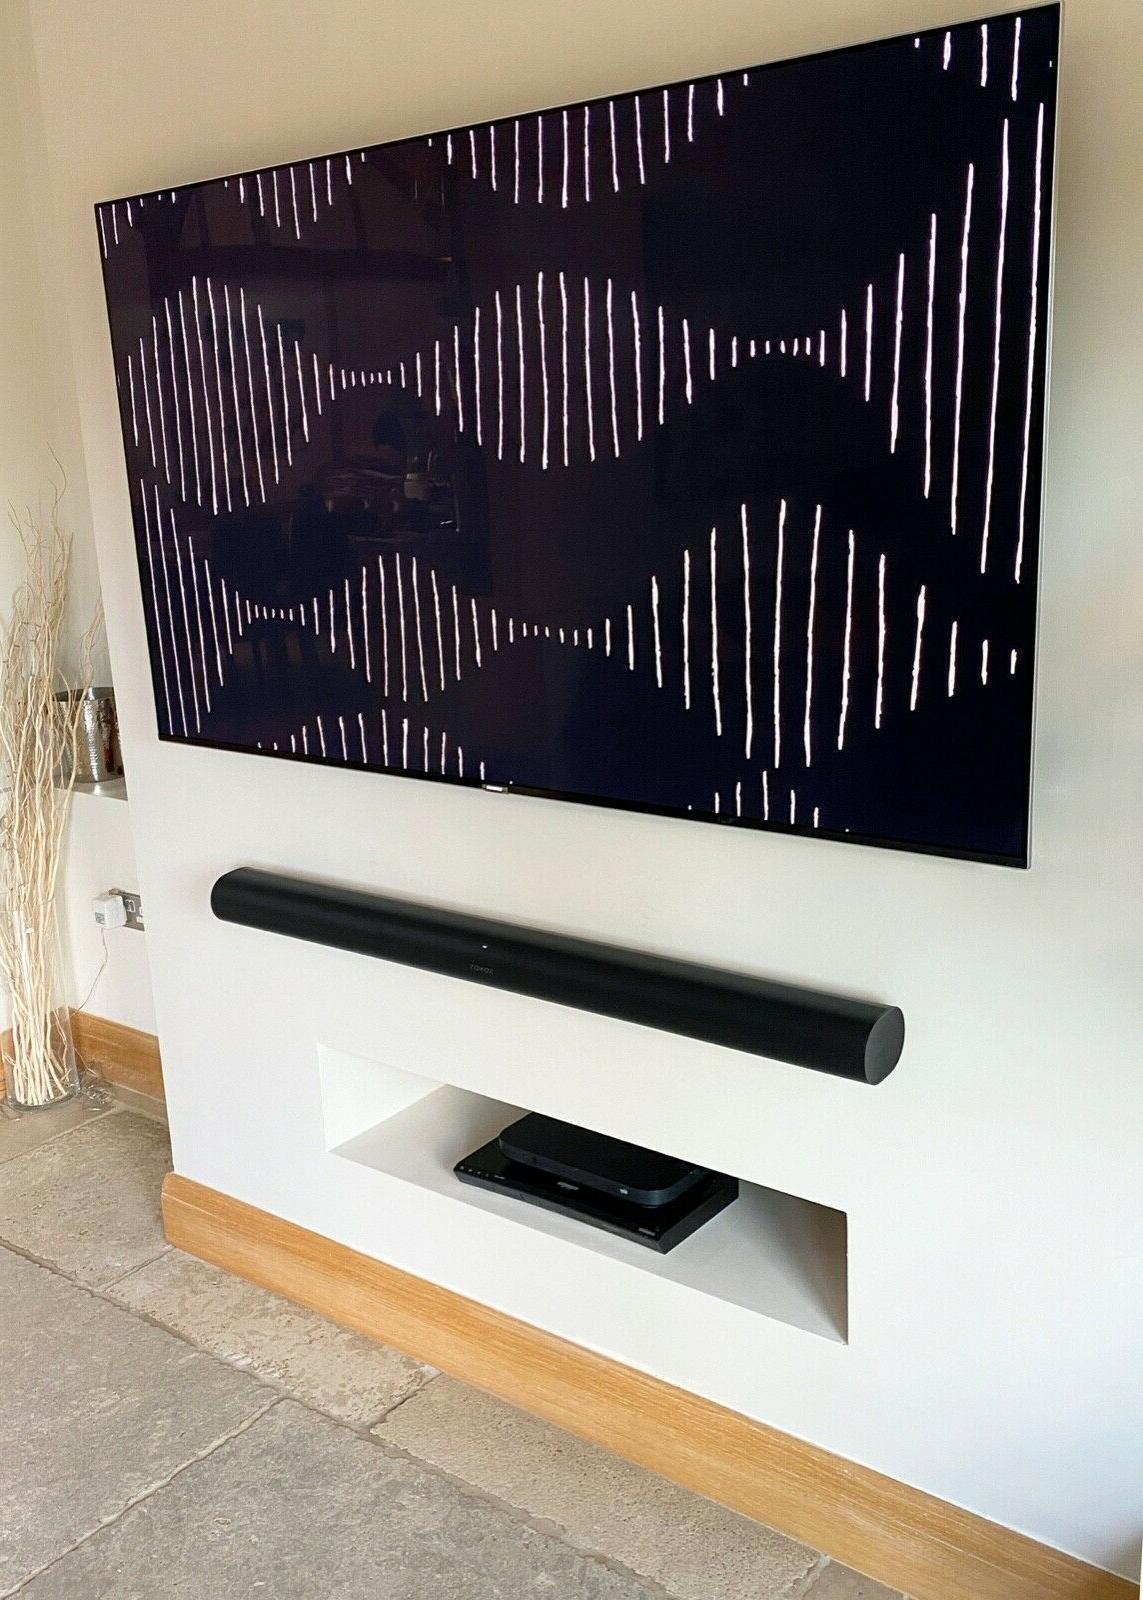 Wall Mount Bracket designed for Soundbar available